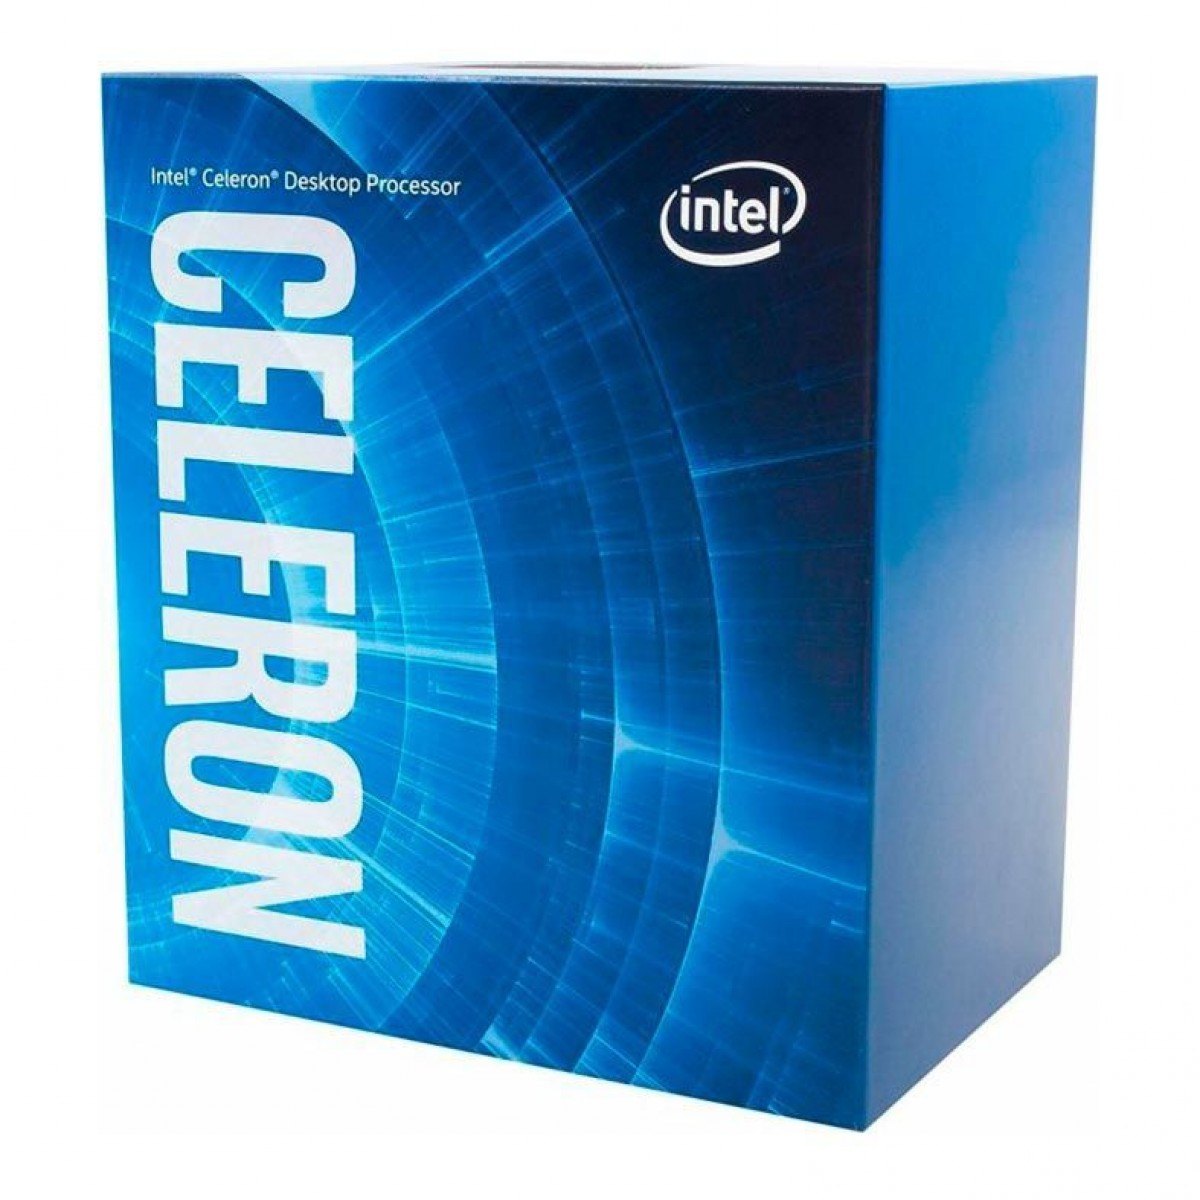 Processador Intel Celeron G4930 3.2GHz, 2-Cores 2-Threads, LGA 1151, BX80684G4930